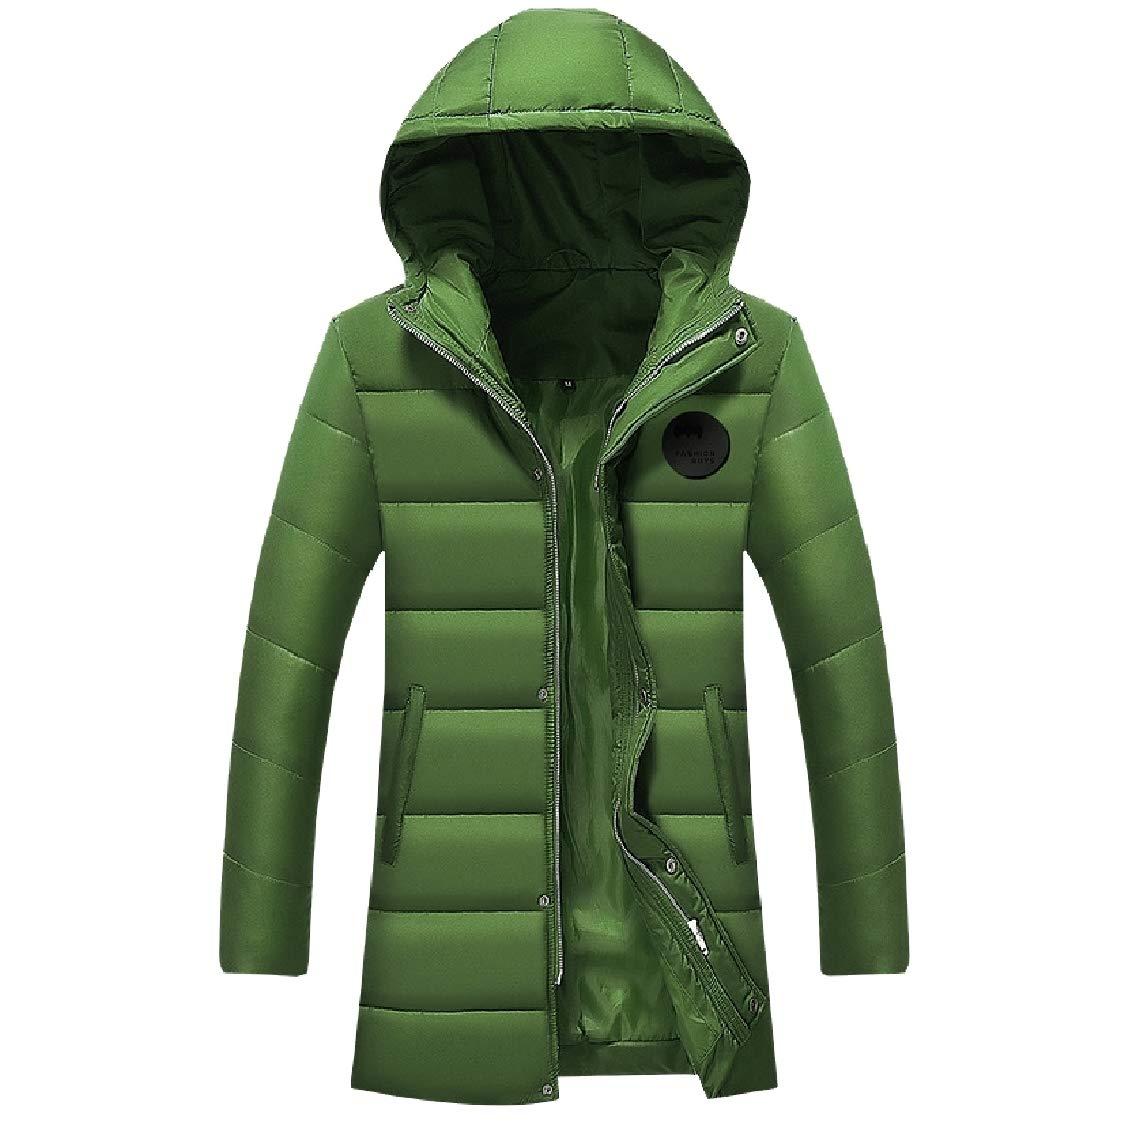 FreelyMen Windproof Oversize Warm Hooded Outdoor Down Jackets